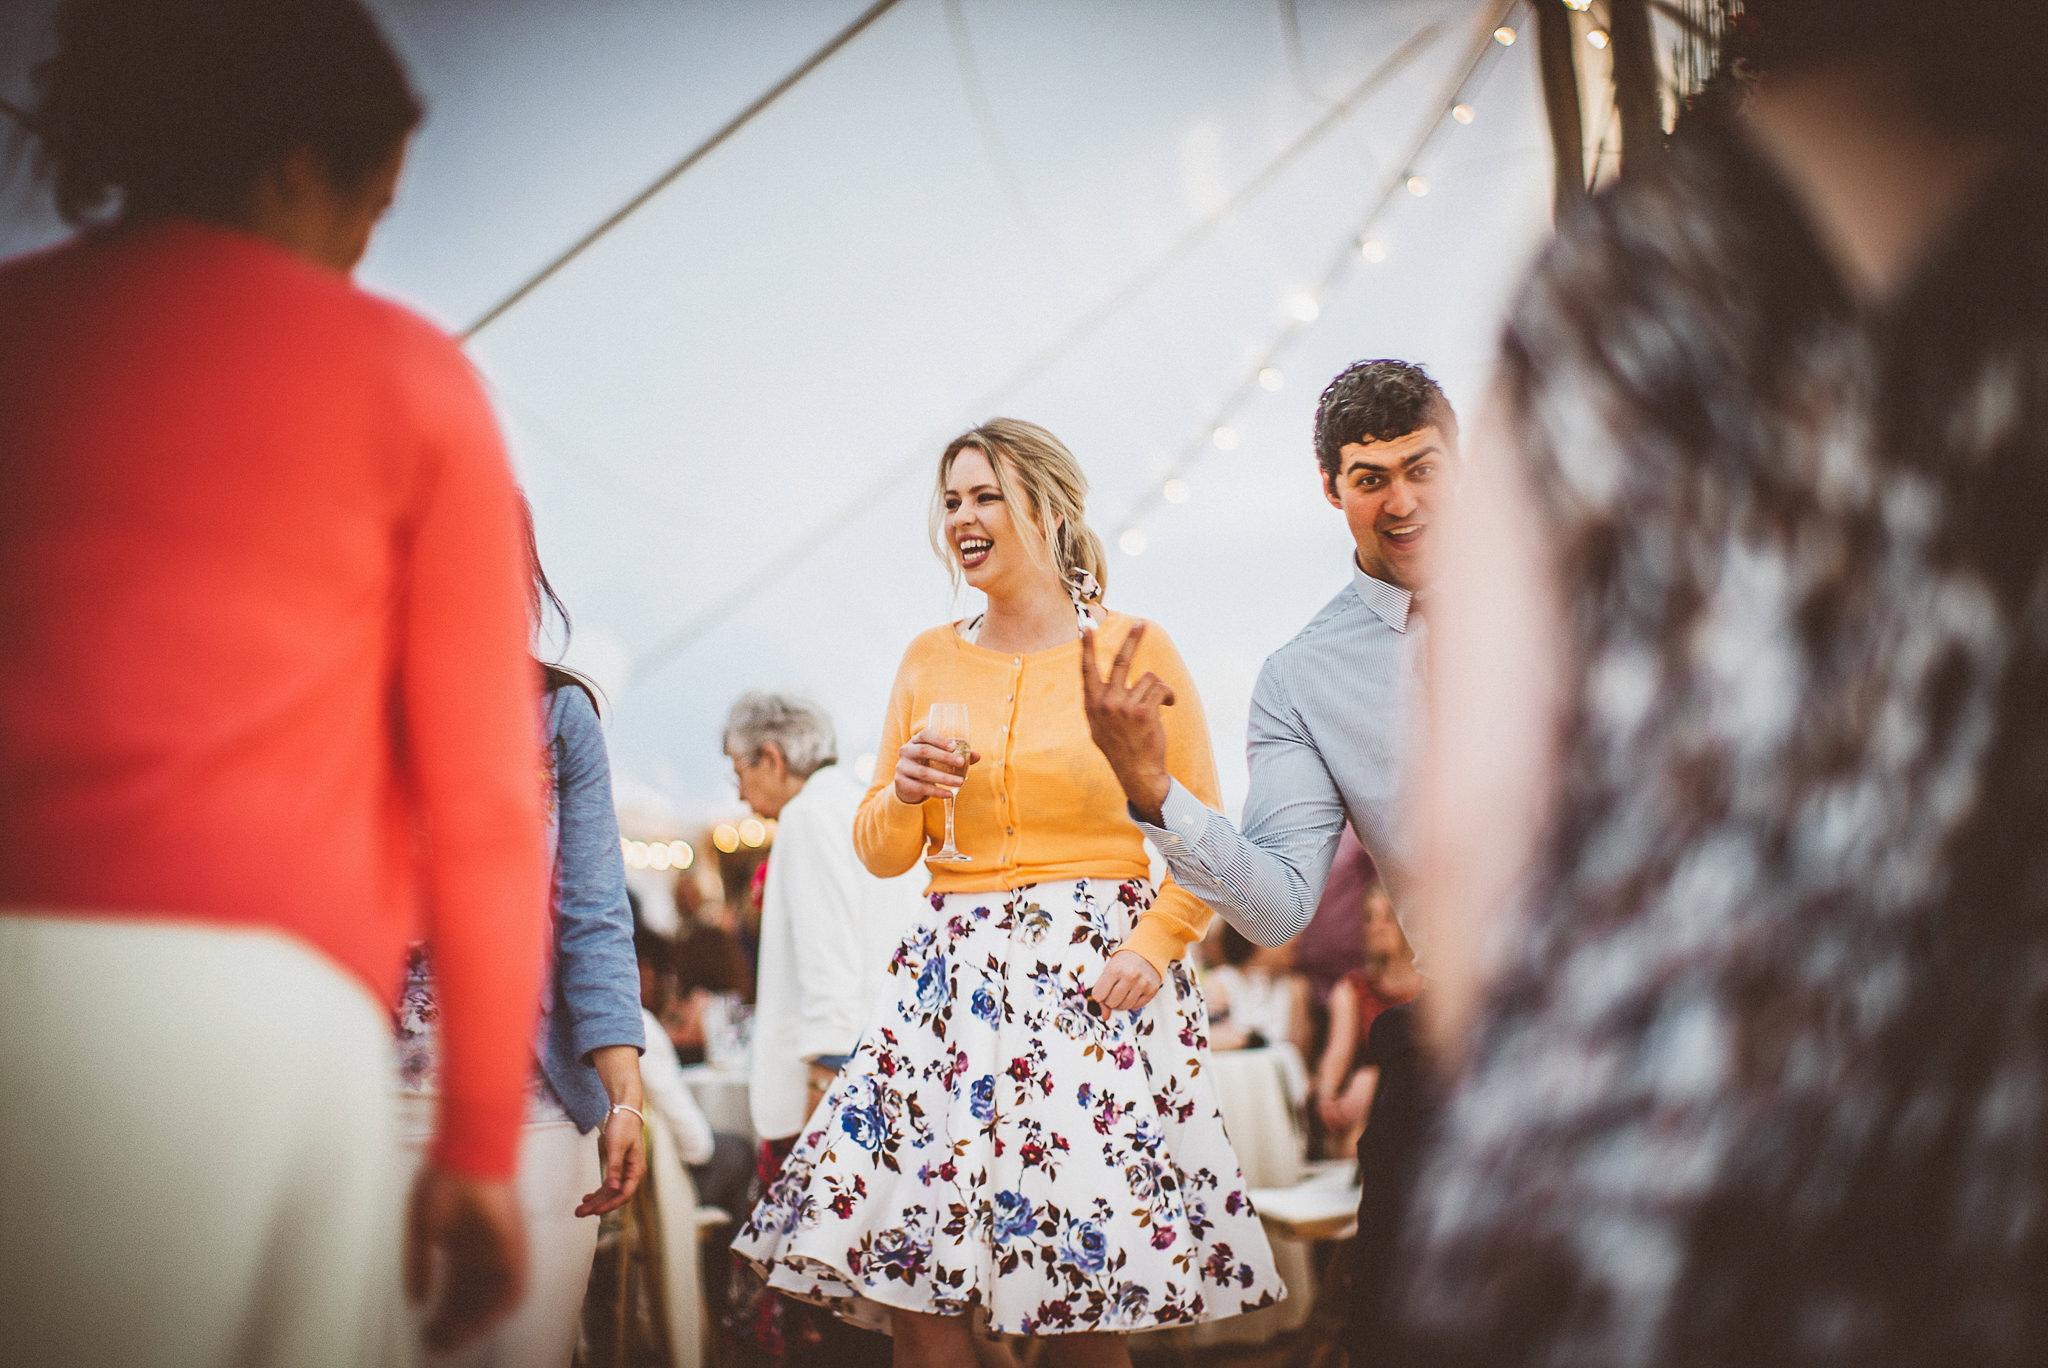 paul-marbrook-Farm-Wedding-Photographer-Lancashire-90096